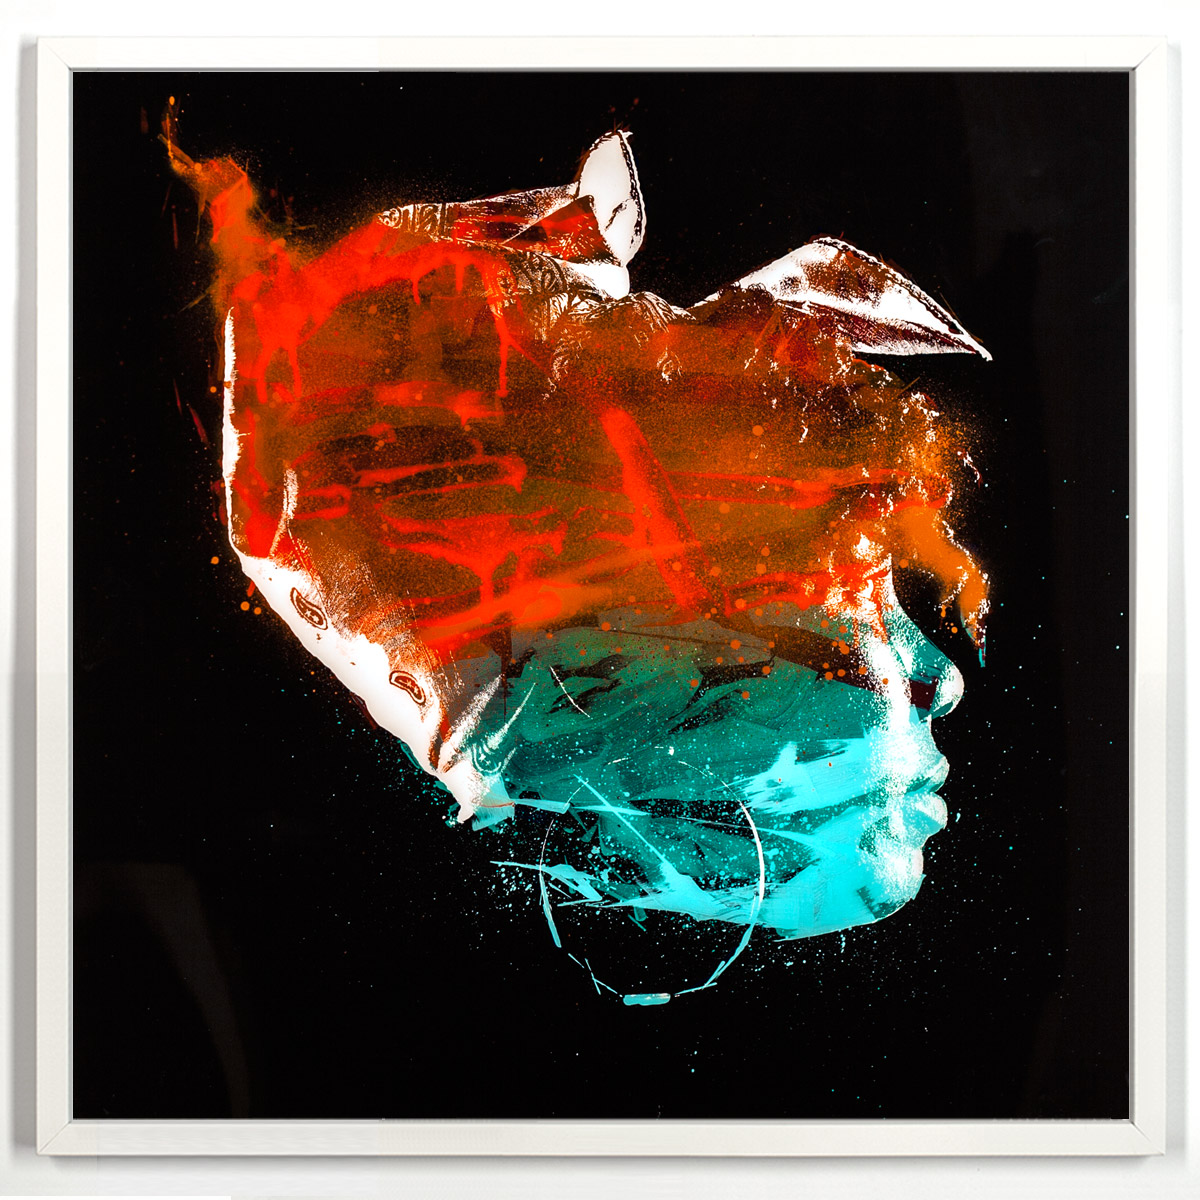 "Yolanda Entropy β  Enamel, Acrylic and Spray Paint on Plexiglass 52"" x 52"" $1,800 Includes a 1"" 1/2 White Wood Frame"